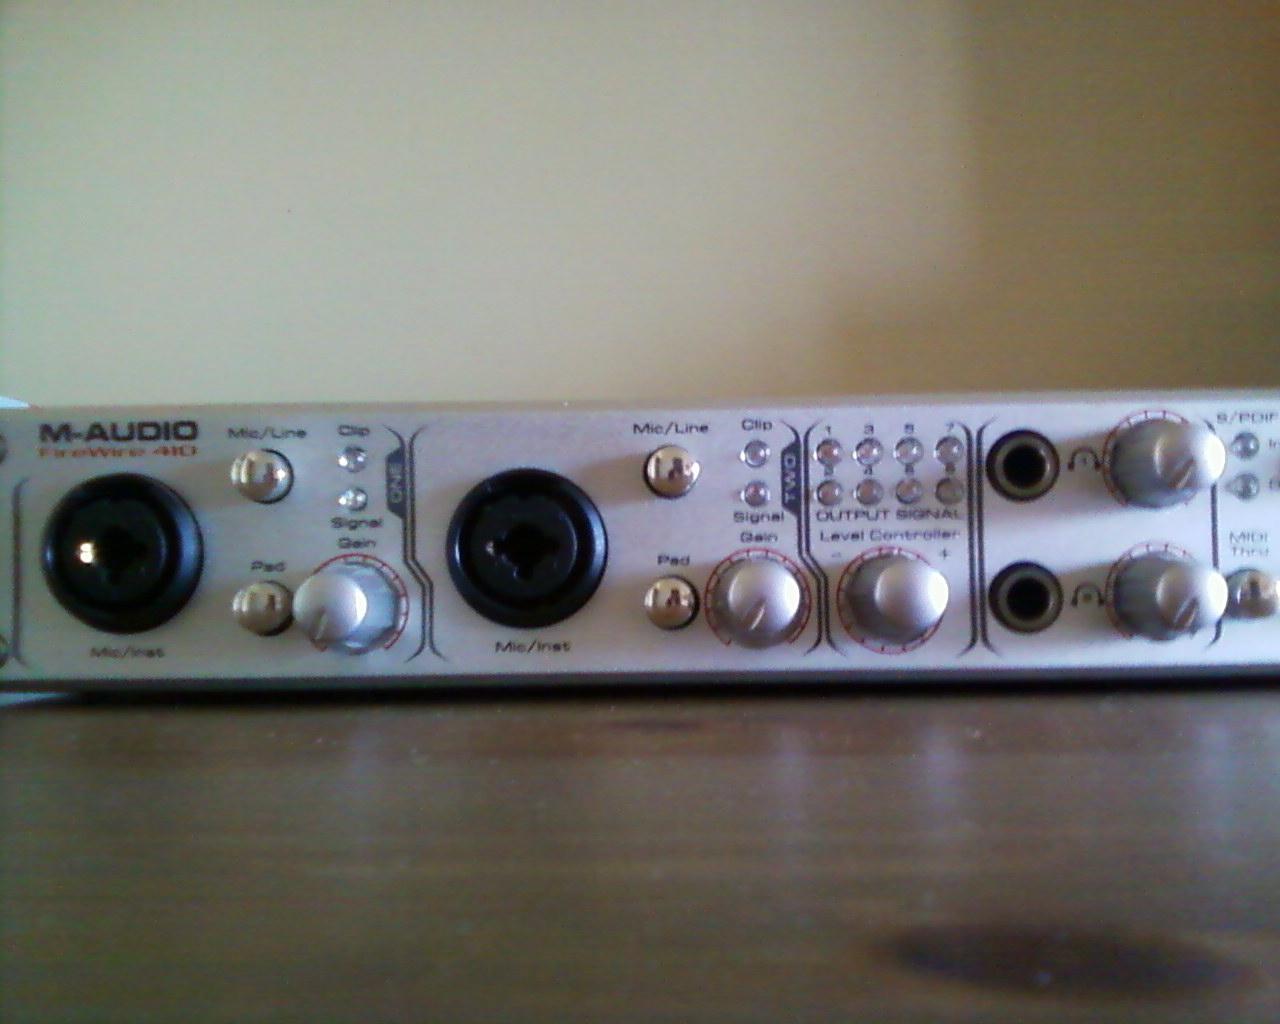 M Audio Firewire 410 Drivers Wire Center 32pfl3605d Smps Power Supply Regulator Schematic Circuit Image 249742 Audiofanzine Rh En Com Driver Windows 7 10